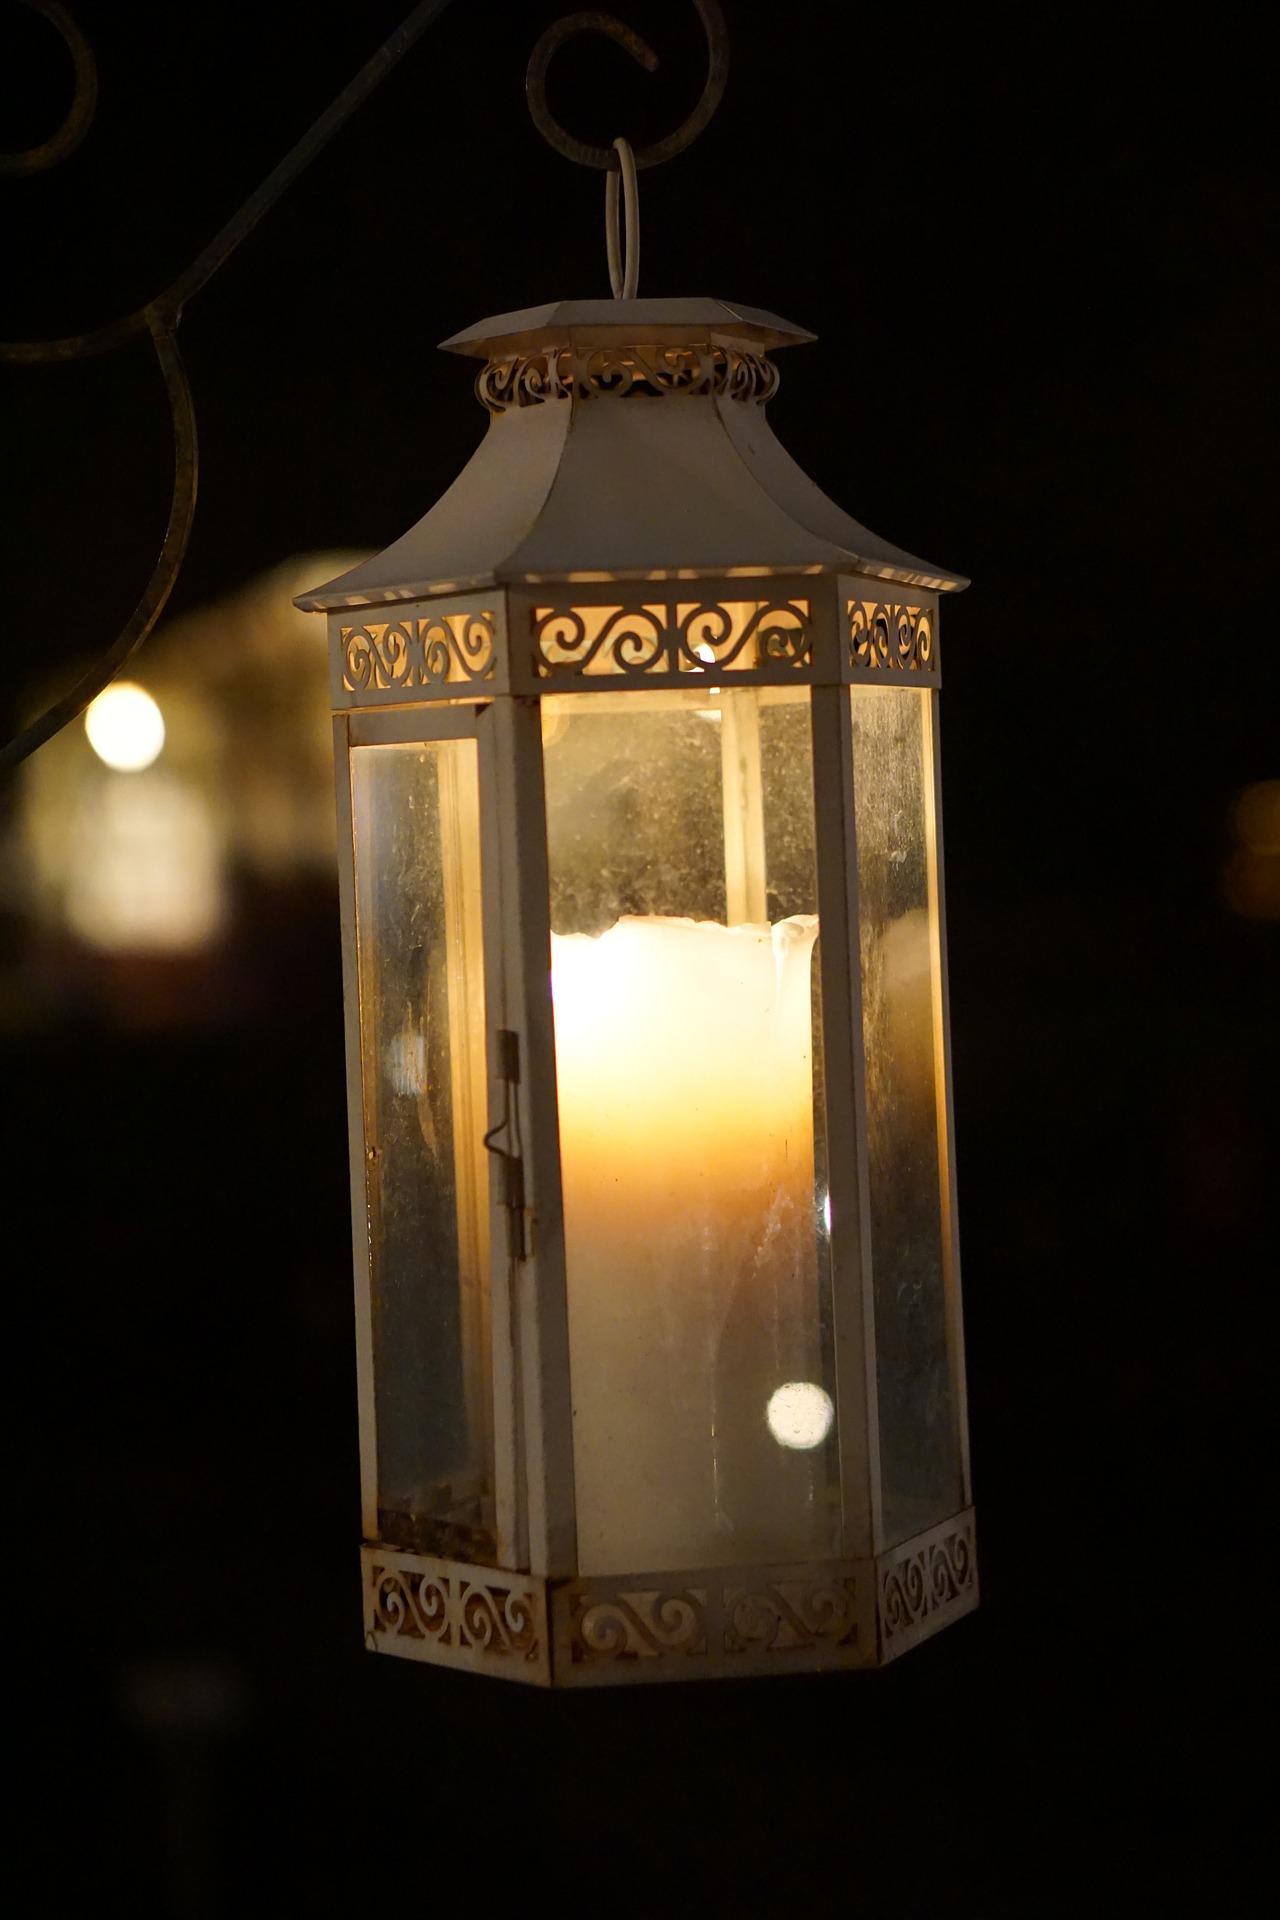 lantern-1442366_1920.jpg